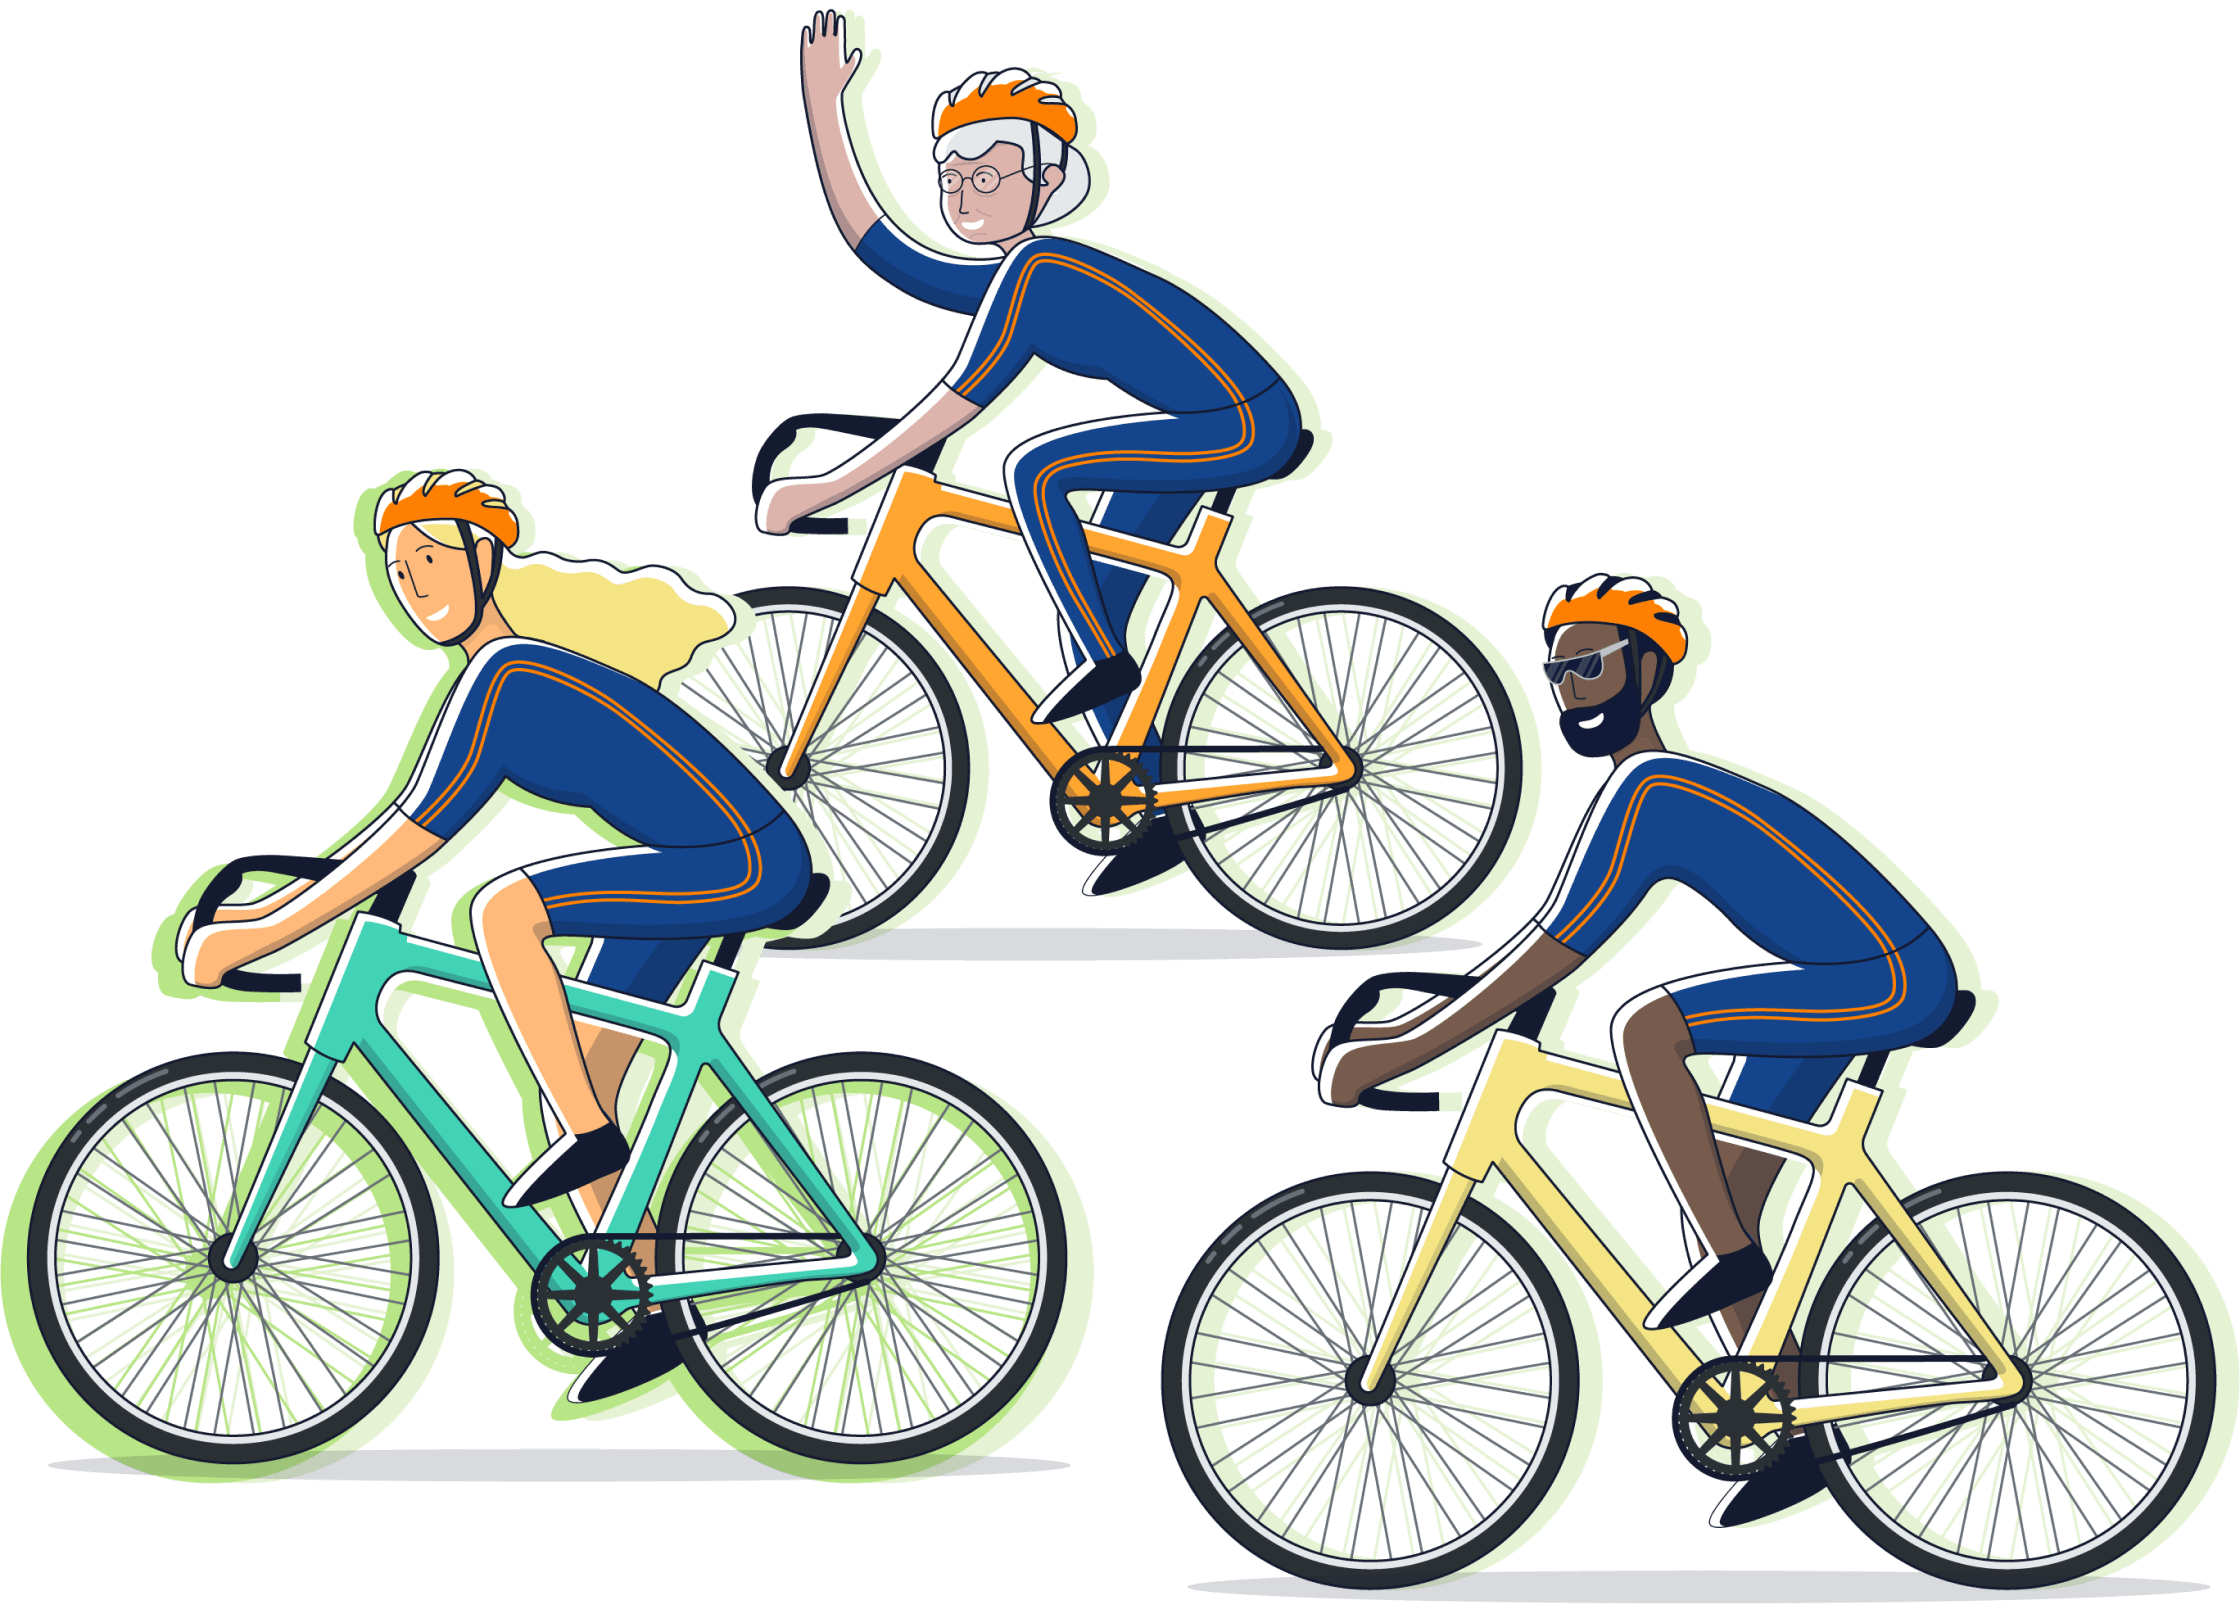 Enthuse Corporate Fundraising Hero Illustration